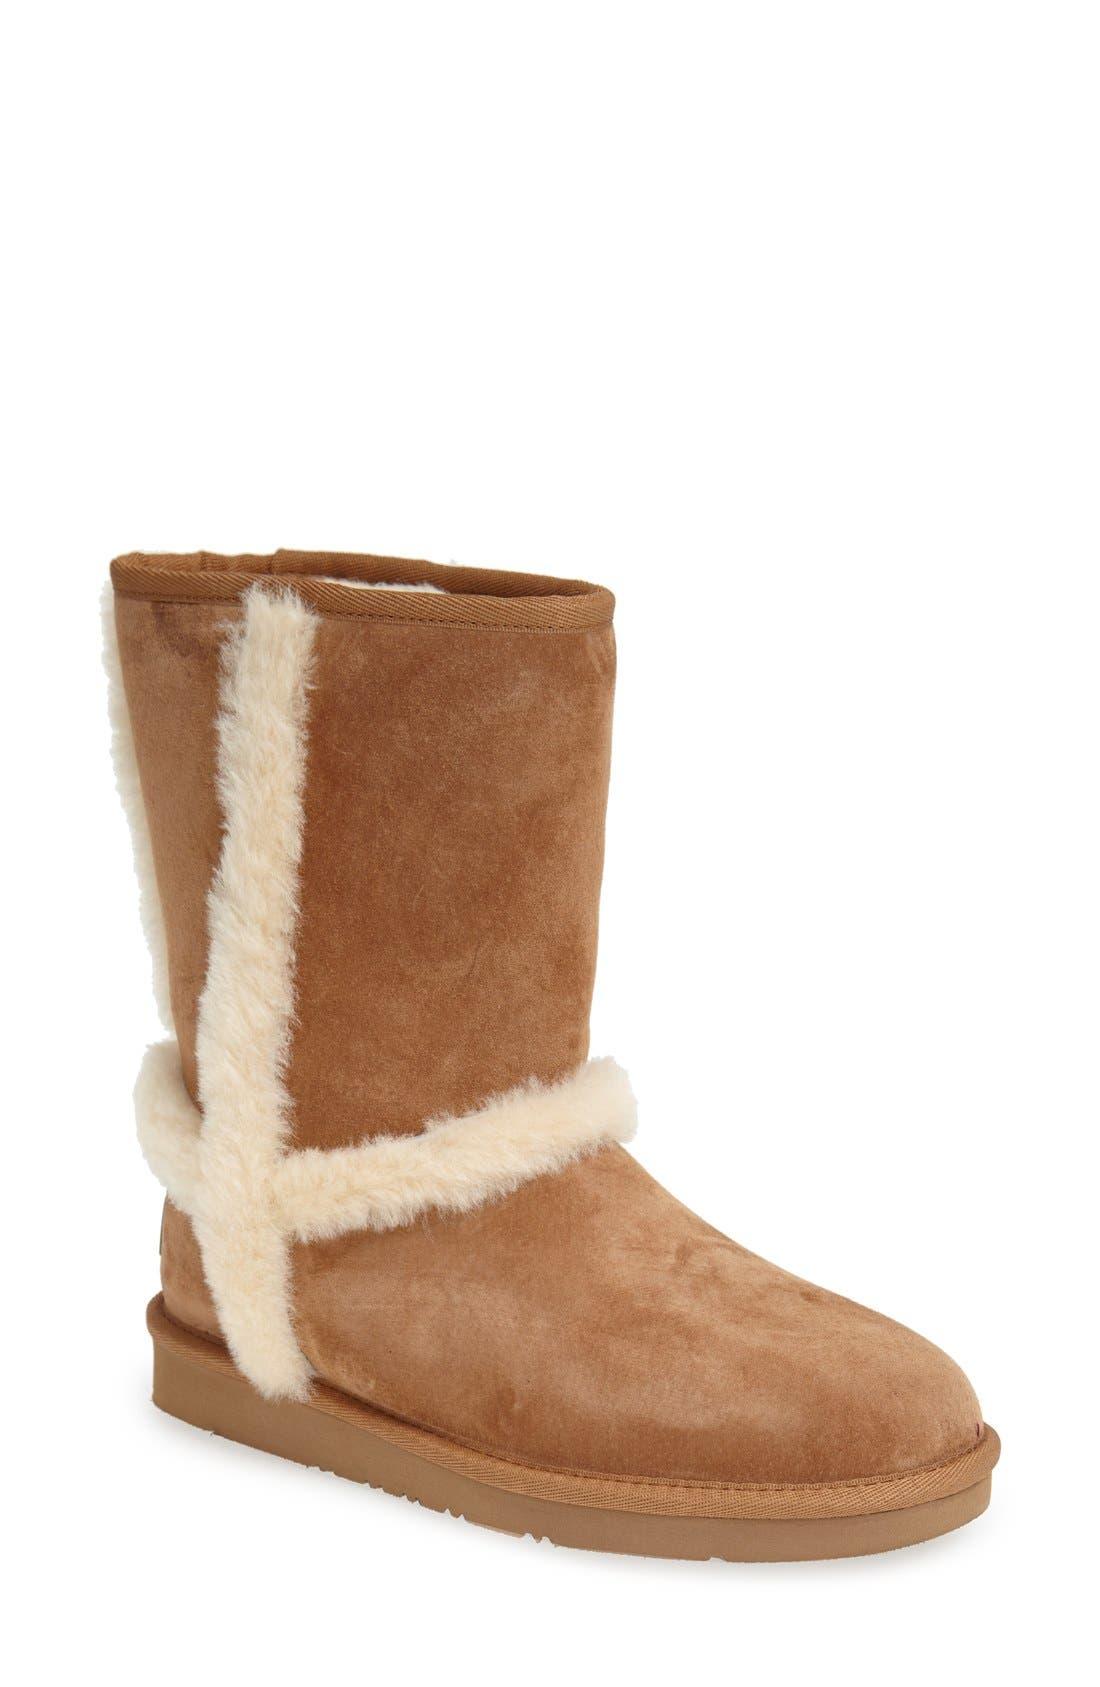 Alternate Image 1 Selected - UGG® 'Carter' Boot (Women)